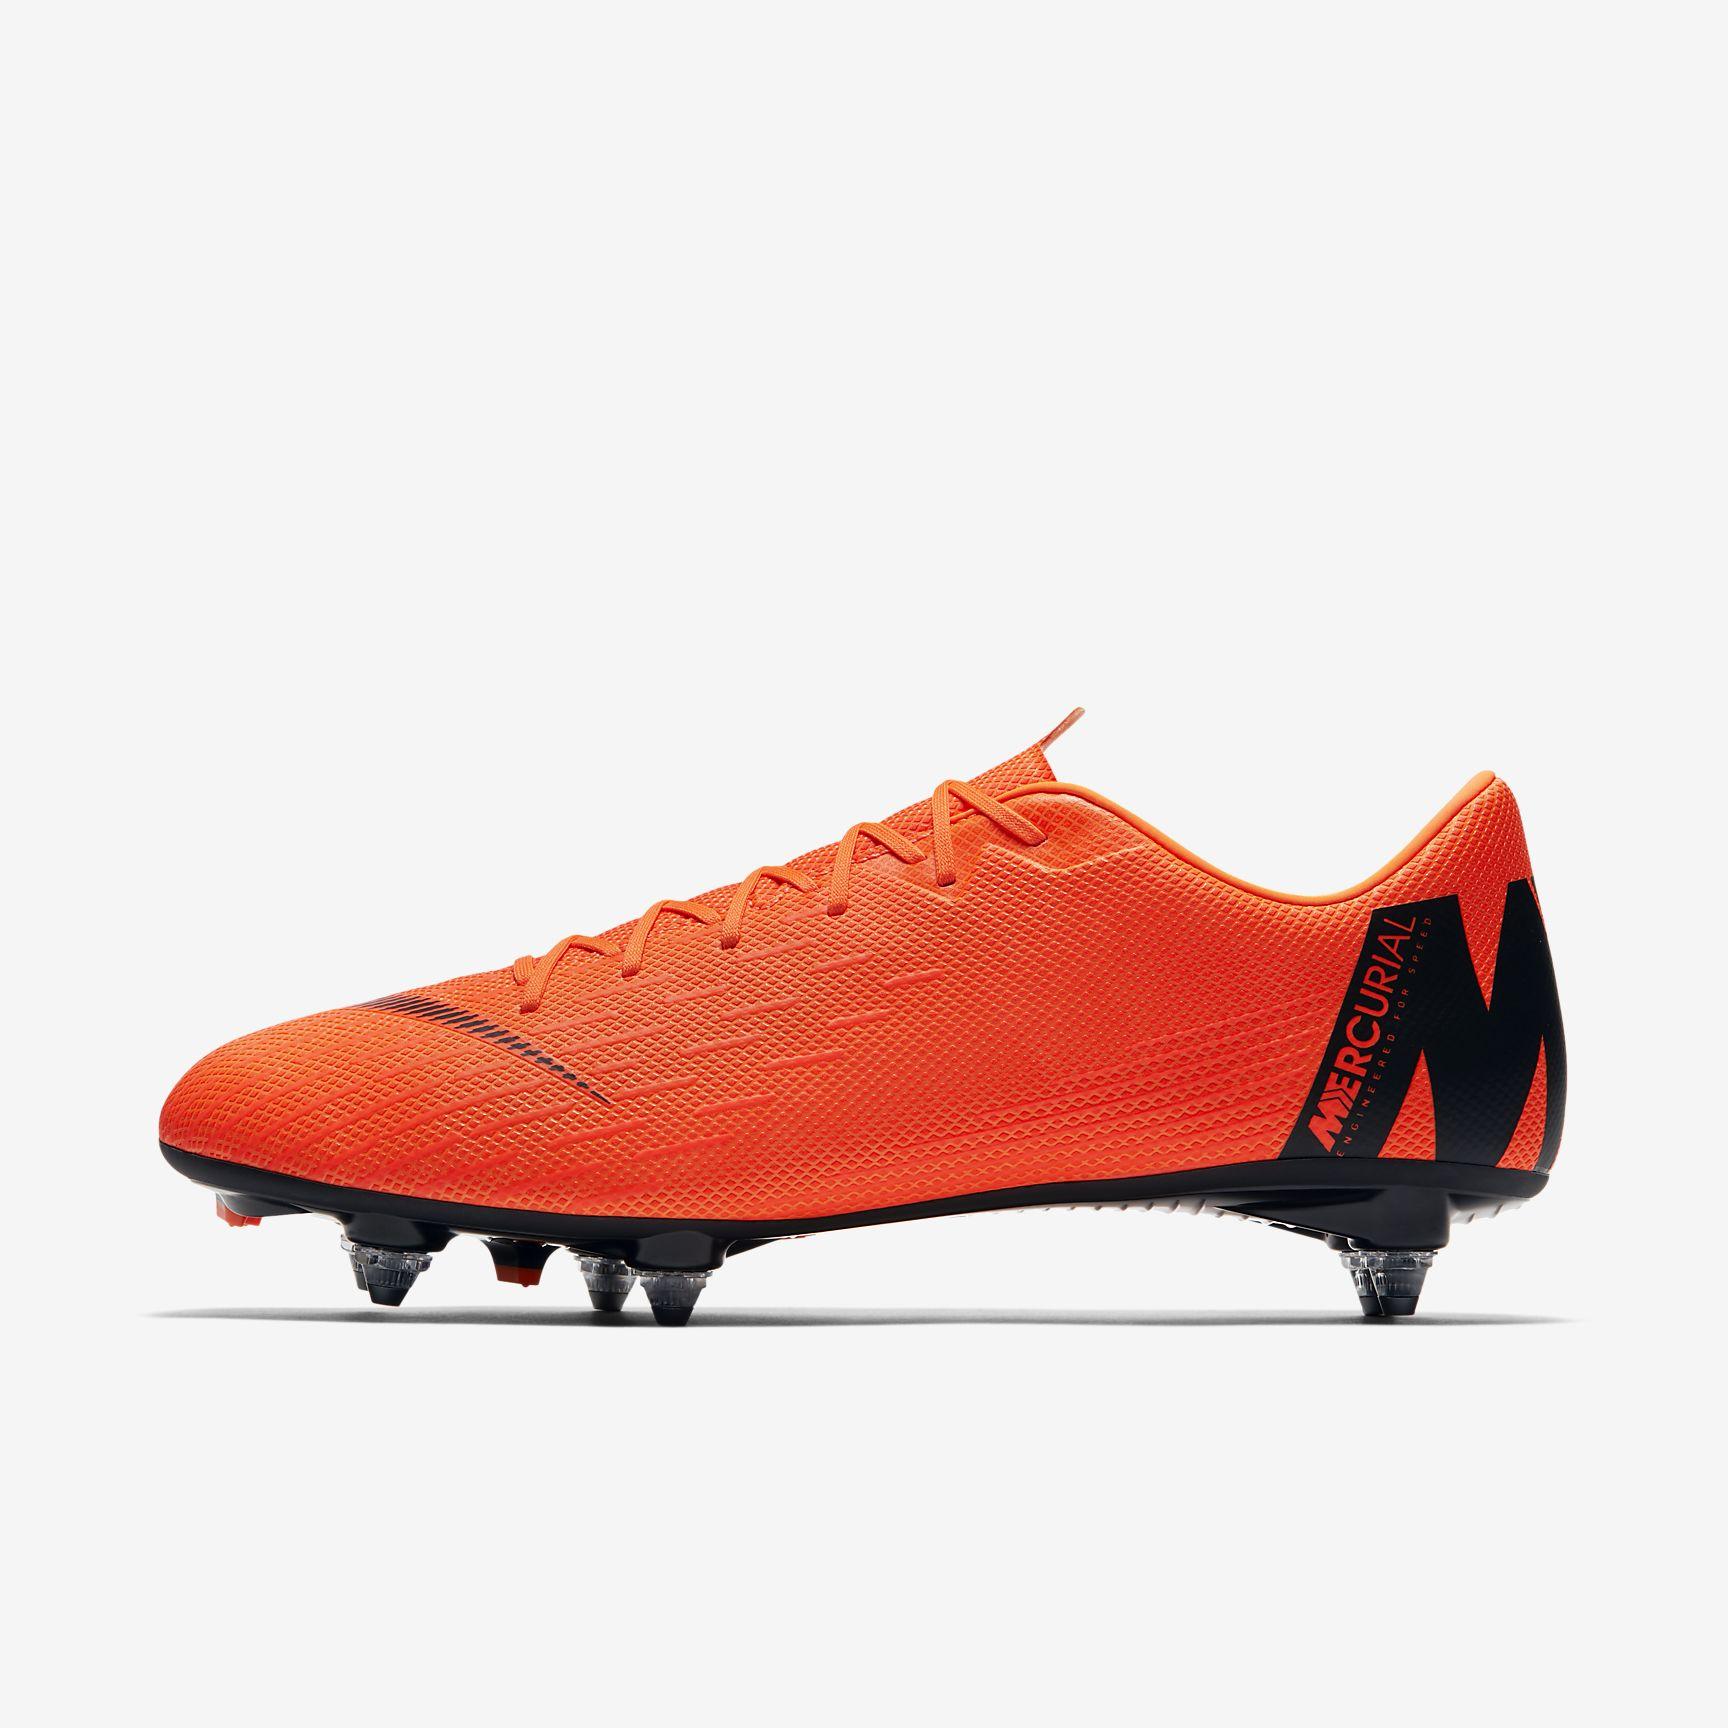 chaussures-football-Nike-Mercurial-Vapor-XII-Academy-img1